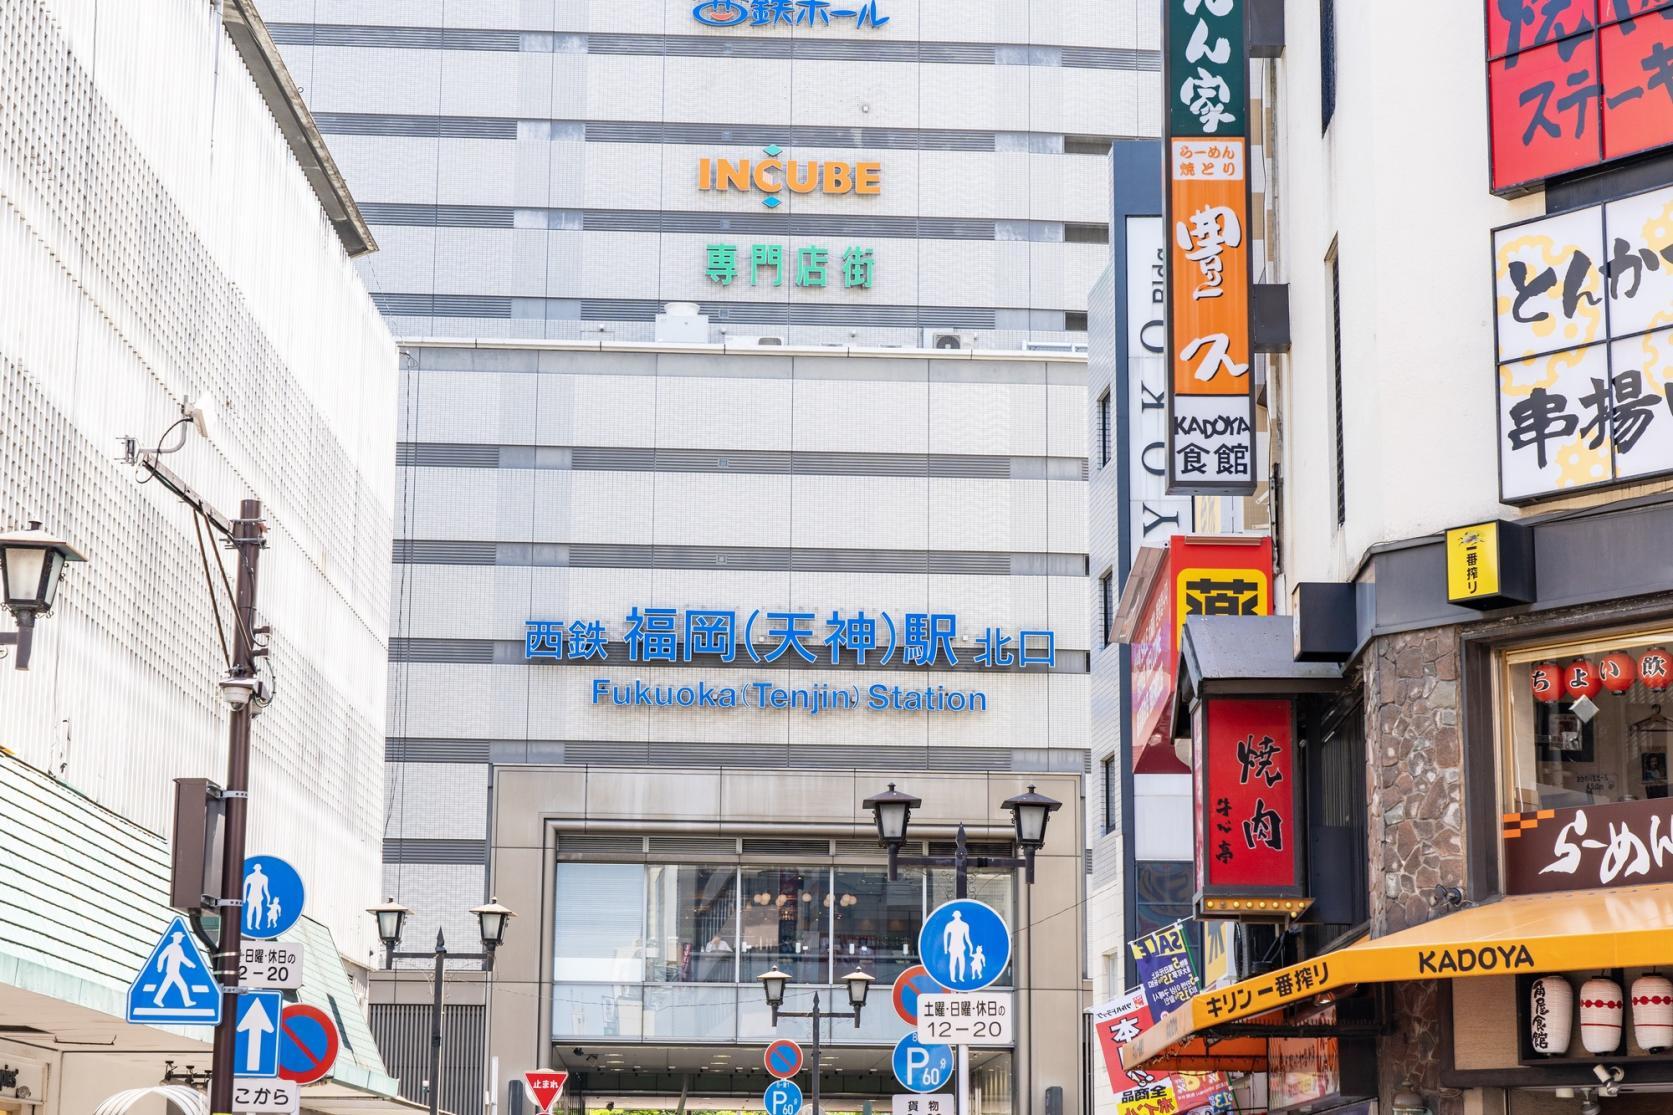 【Day 3】Fukuoka Station-1